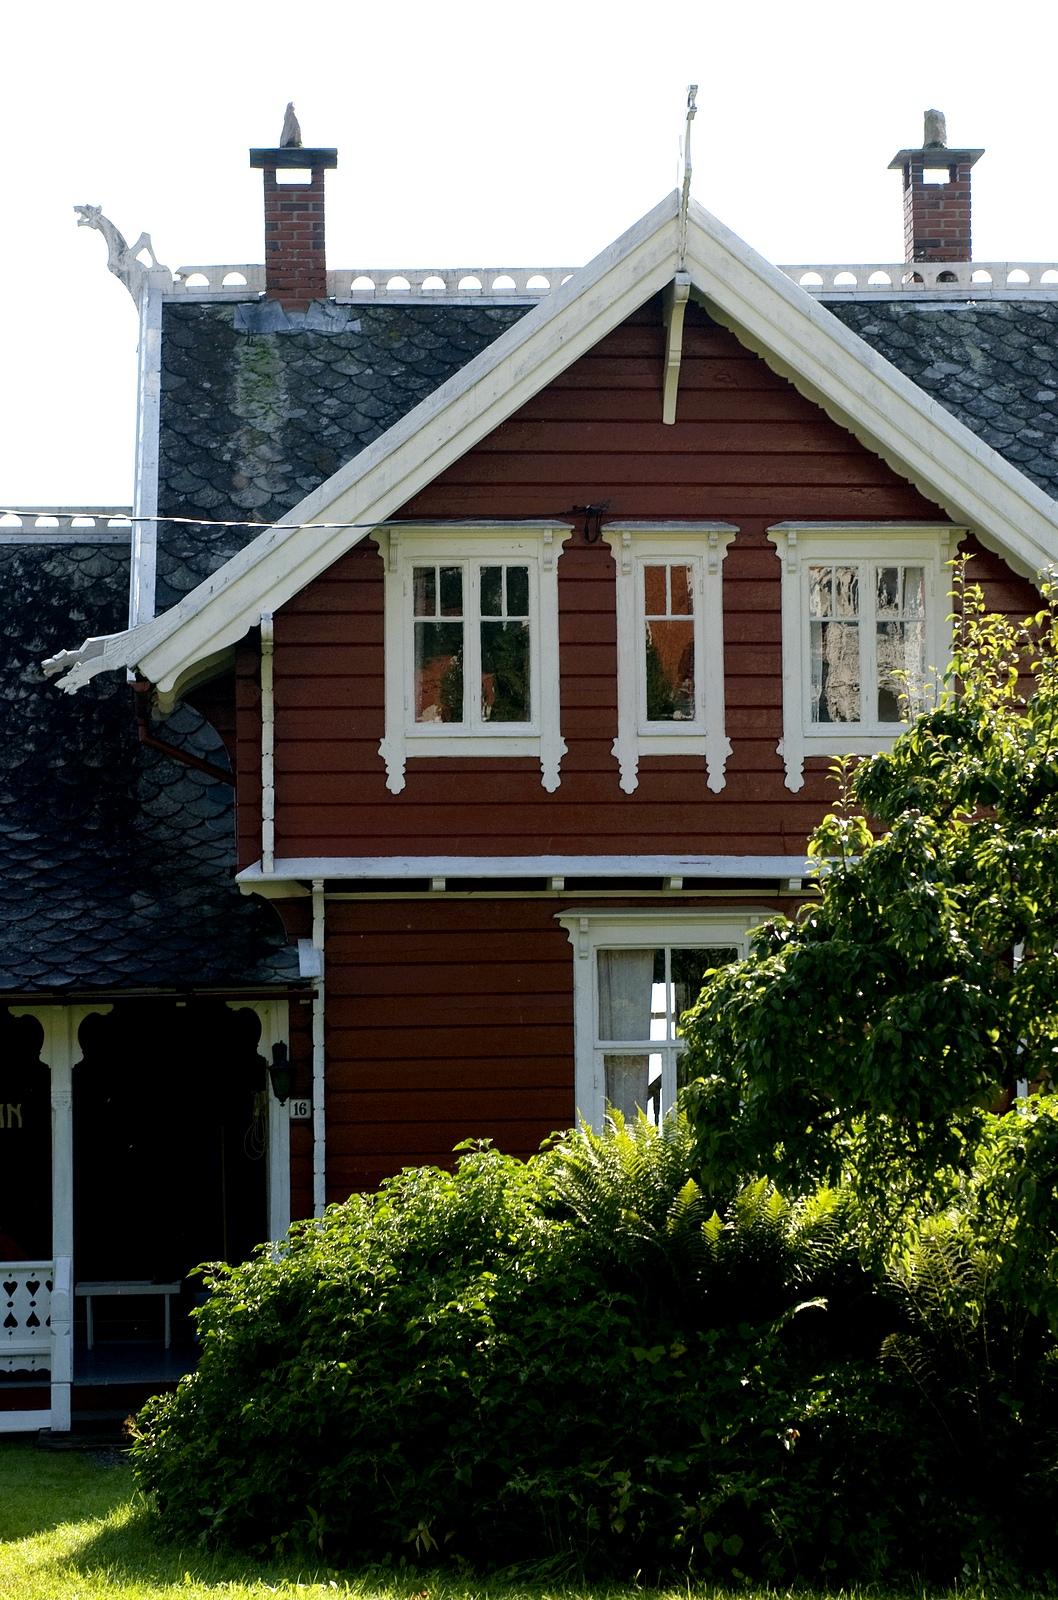 Swiss house in Balestrand